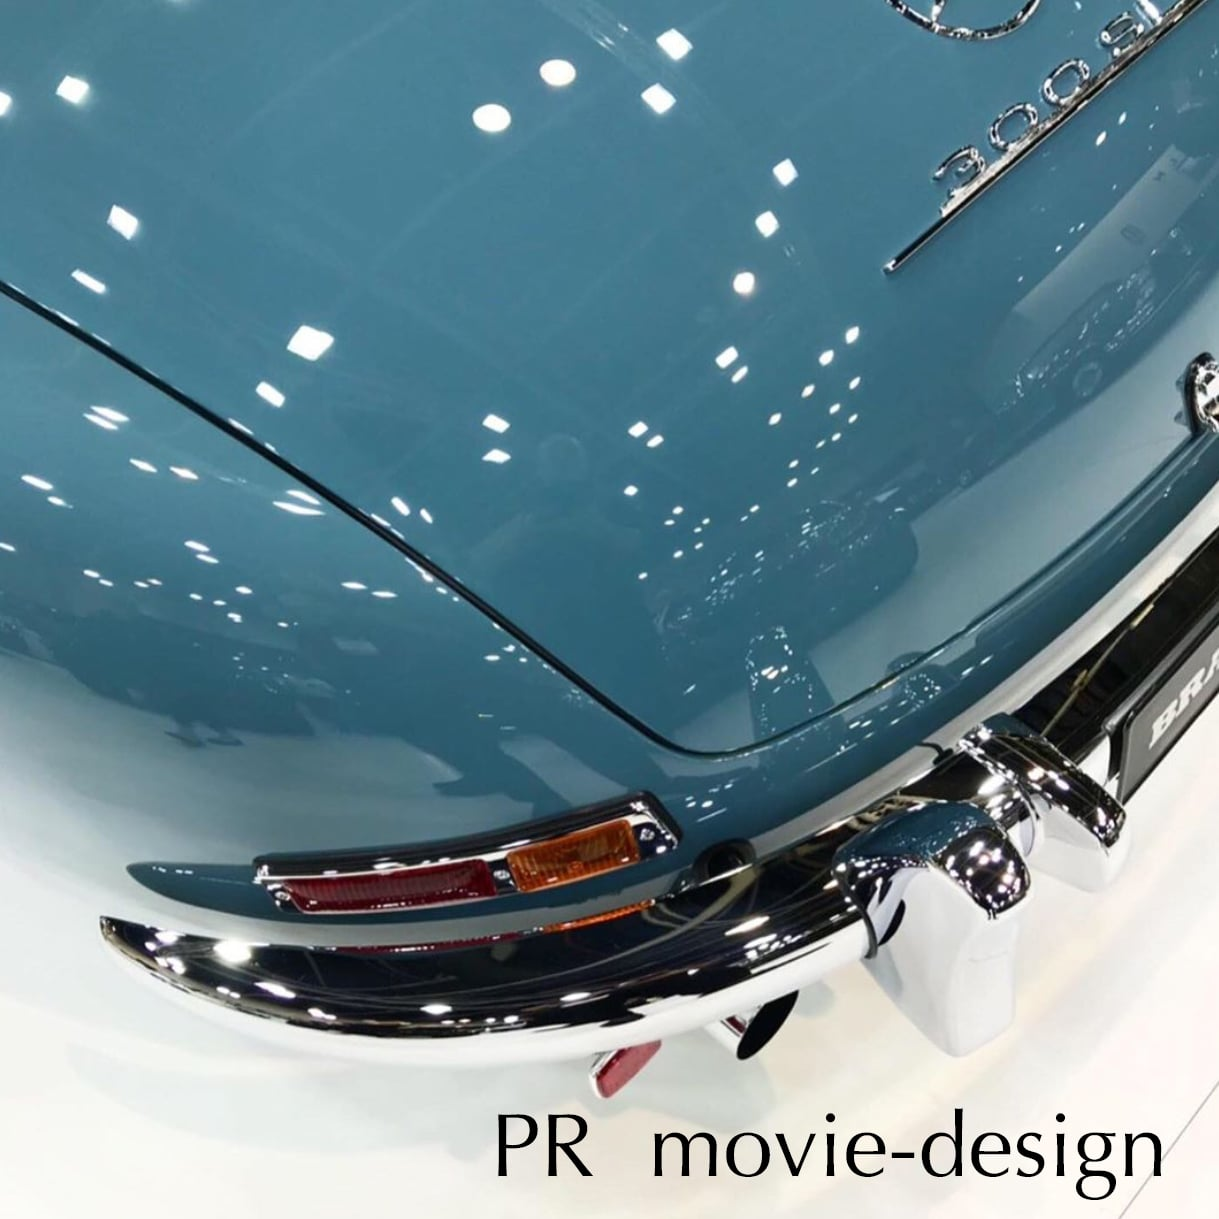 PR movie-design[オリジナルムービー制作チケット]のイメージその1